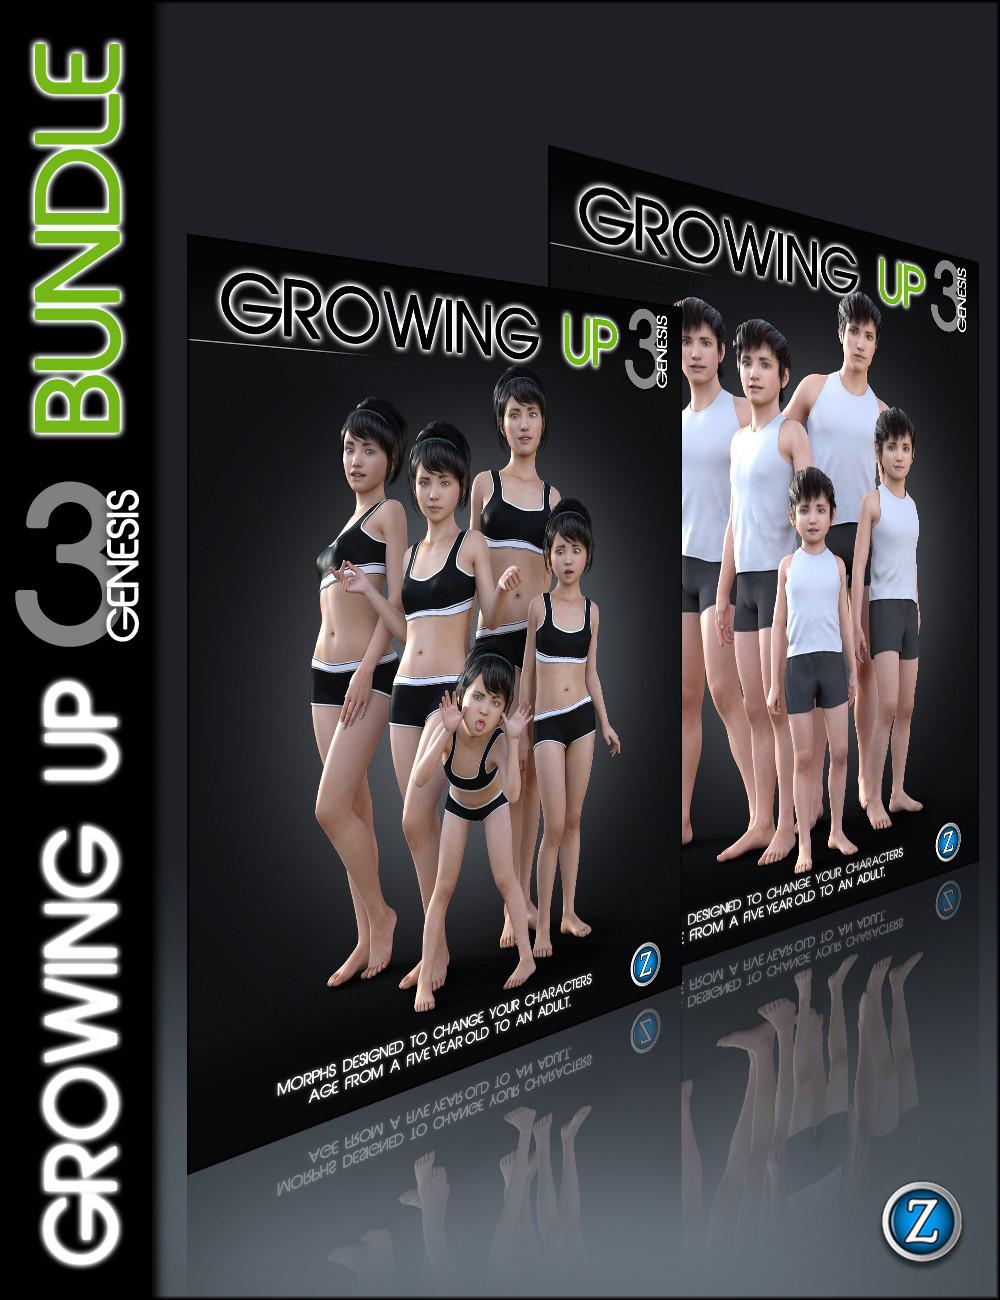 Growing Up for Genesis 3 Bundle by: Zev0, 3D Models by Daz 3D